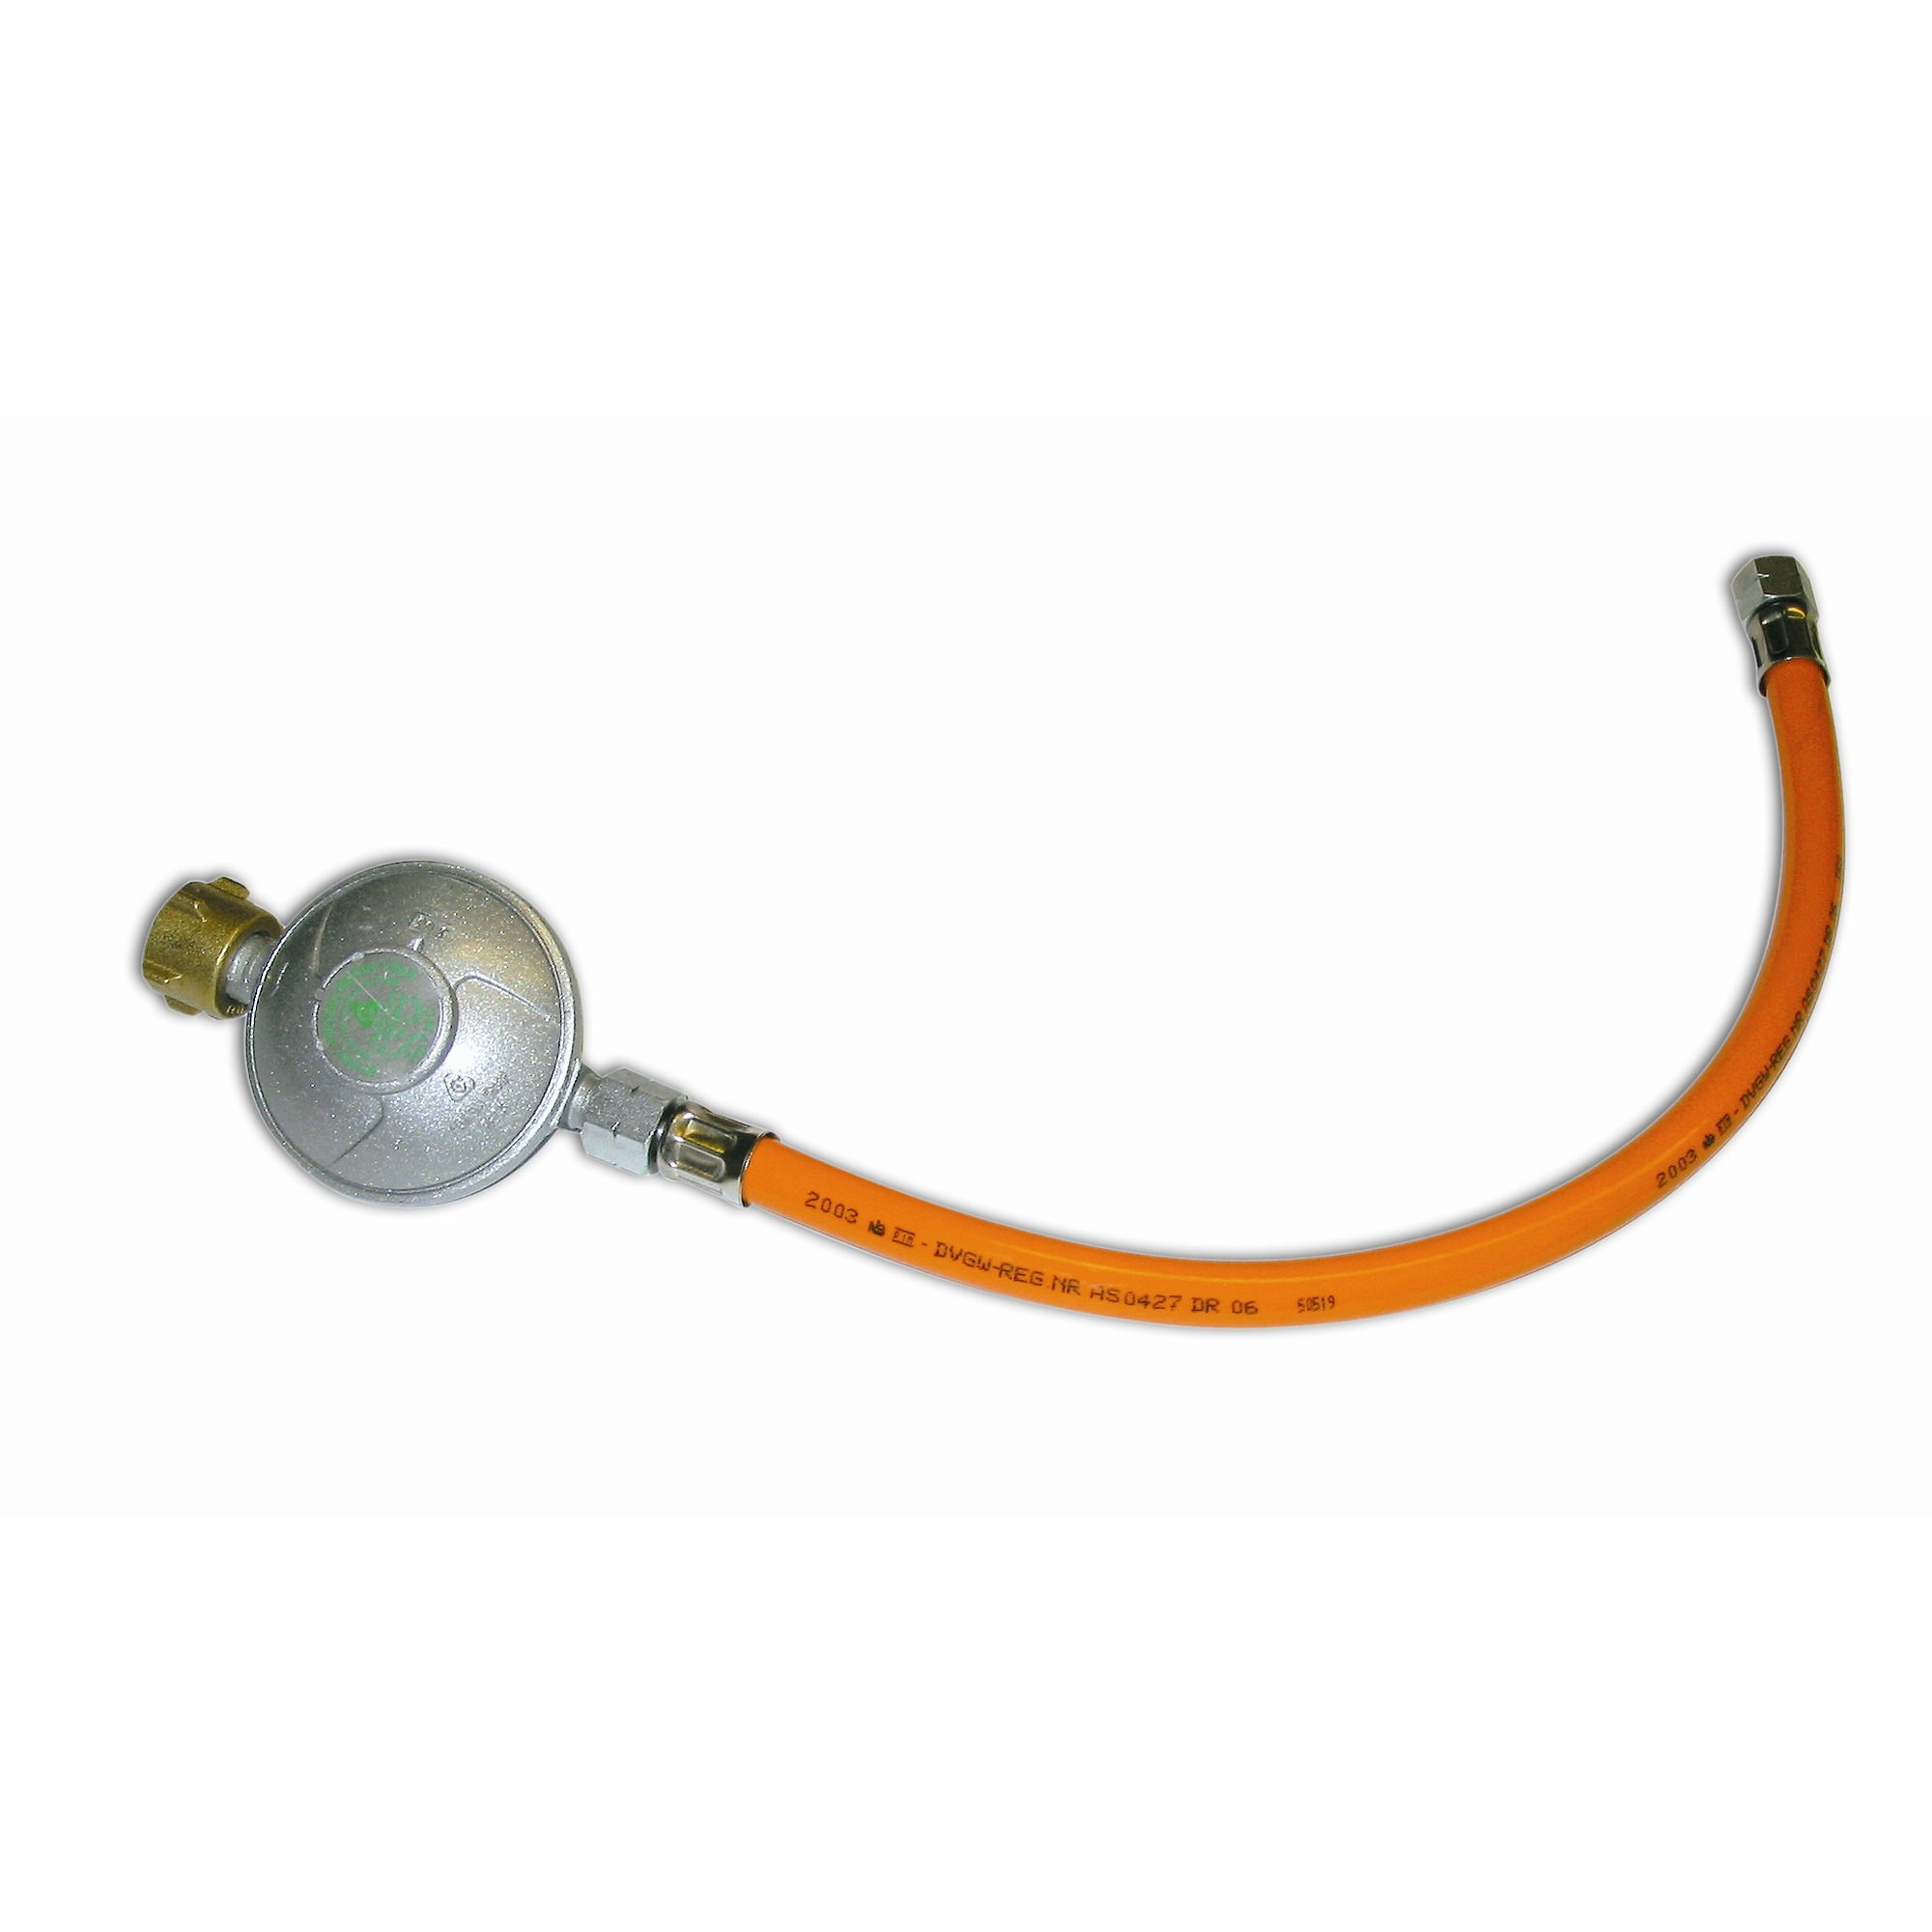 Gasdrukregelaar NL, voor grote gasfles (8453)